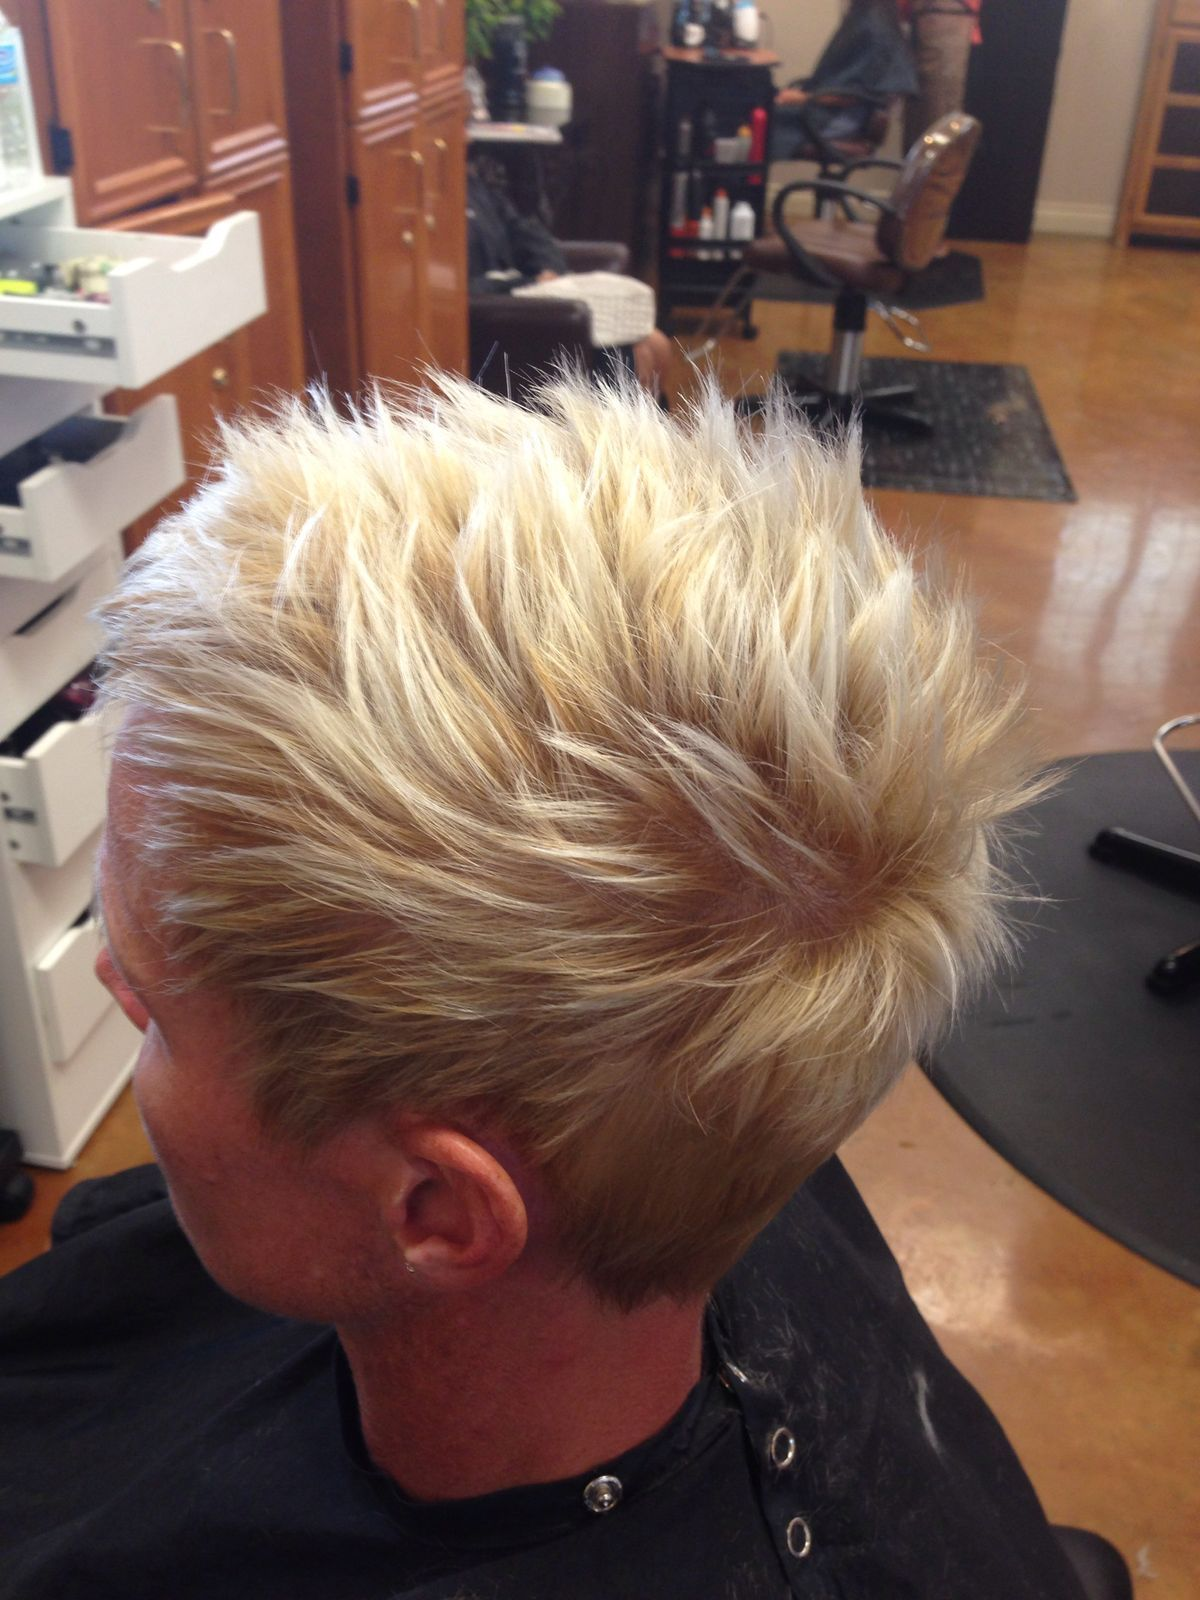 Aedbbddcfaabbedcg pixels hair cuts